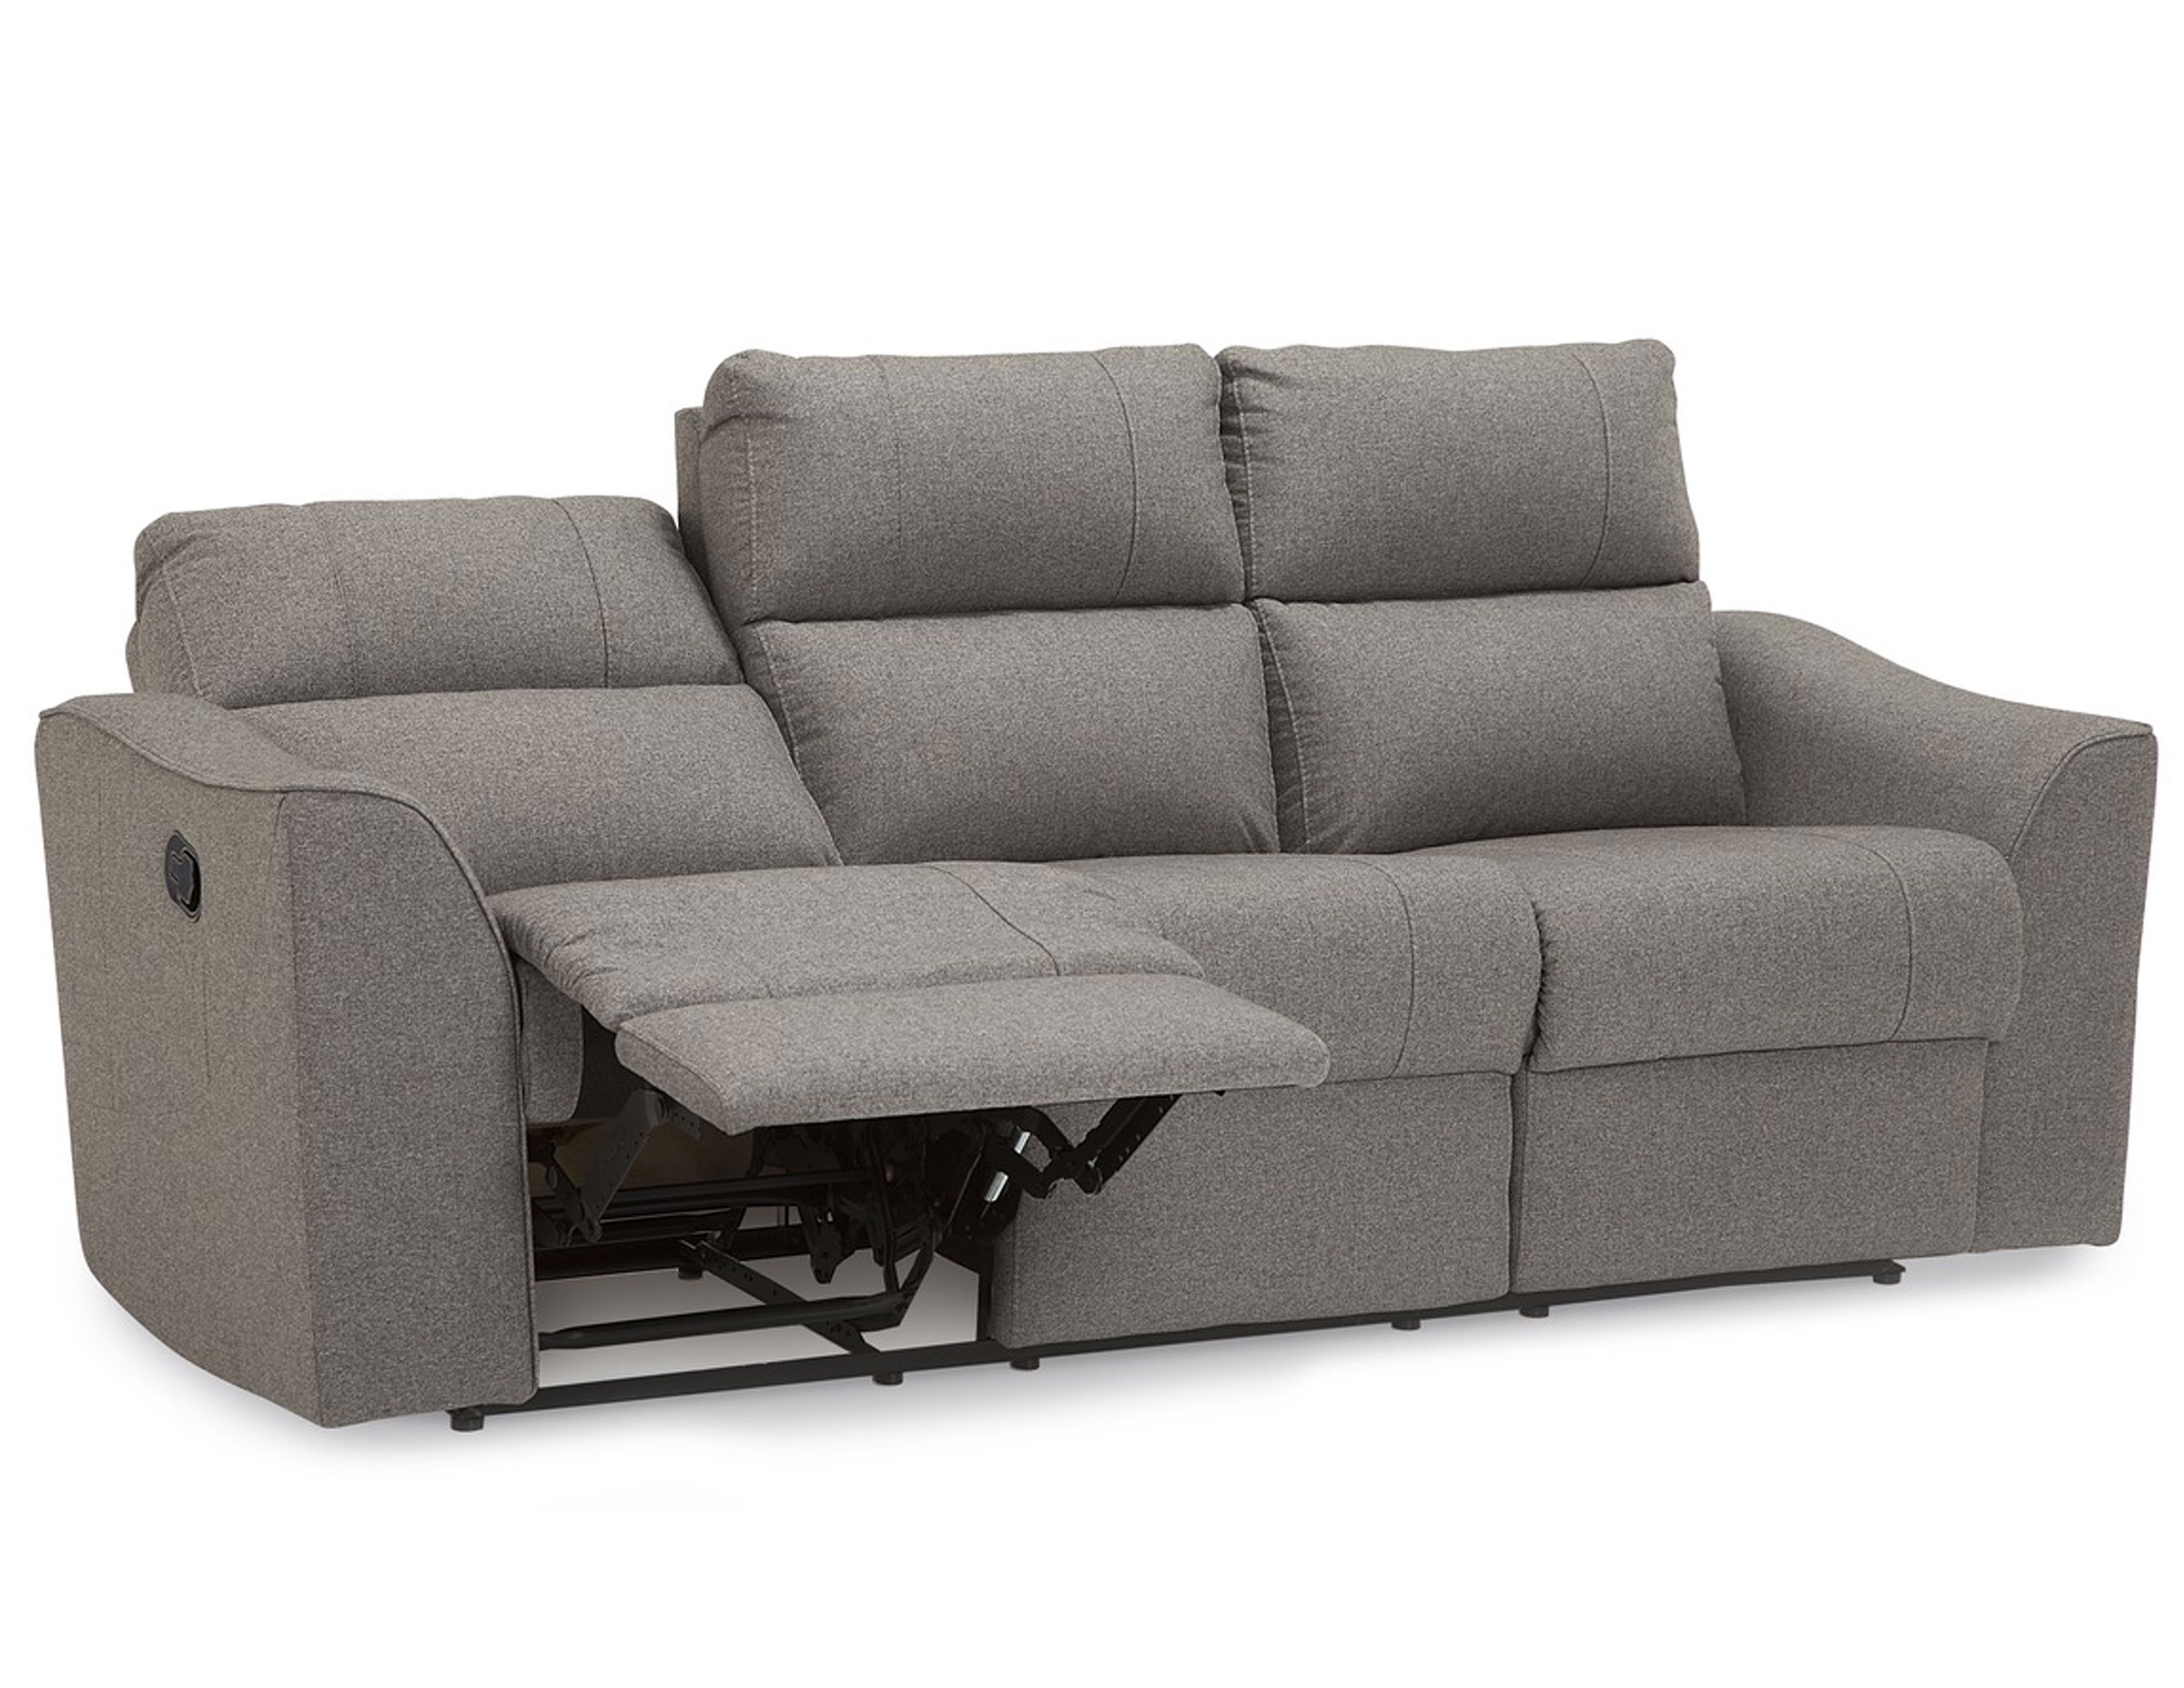 Pleasant Topaz Reclining Sofa Collection 350 Fabrics Sofas And Spiritservingveterans Wood Chair Design Ideas Spiritservingveteransorg